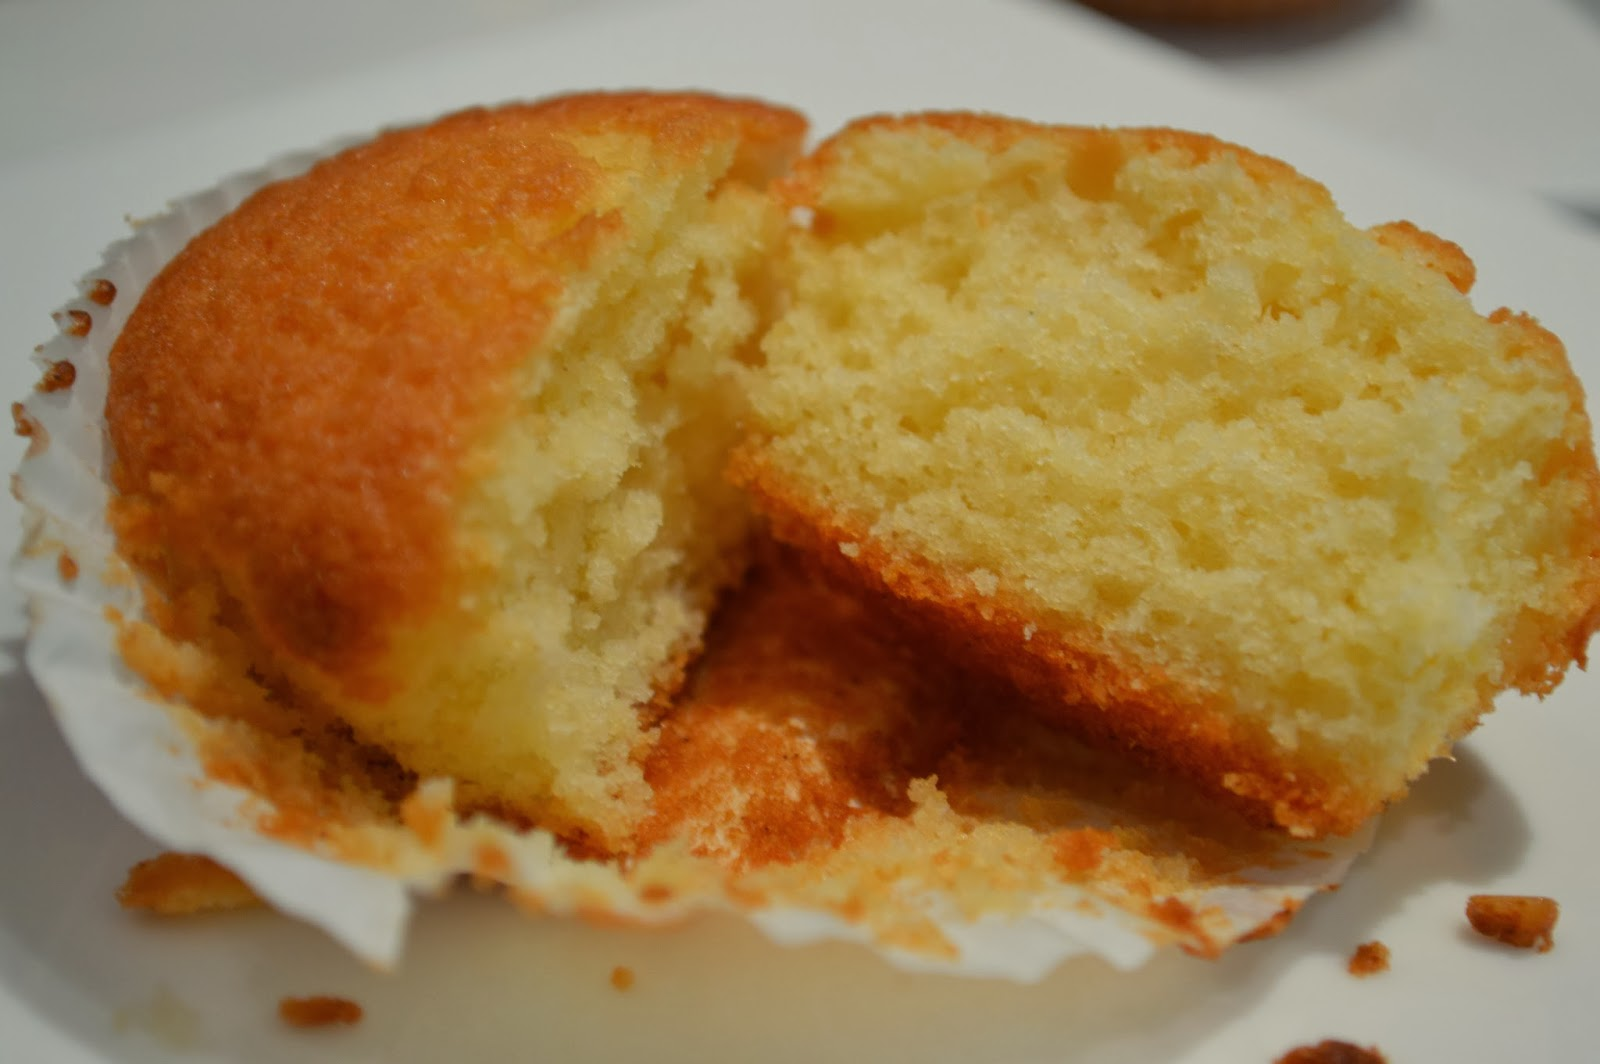 Perfect lemon cupcakes